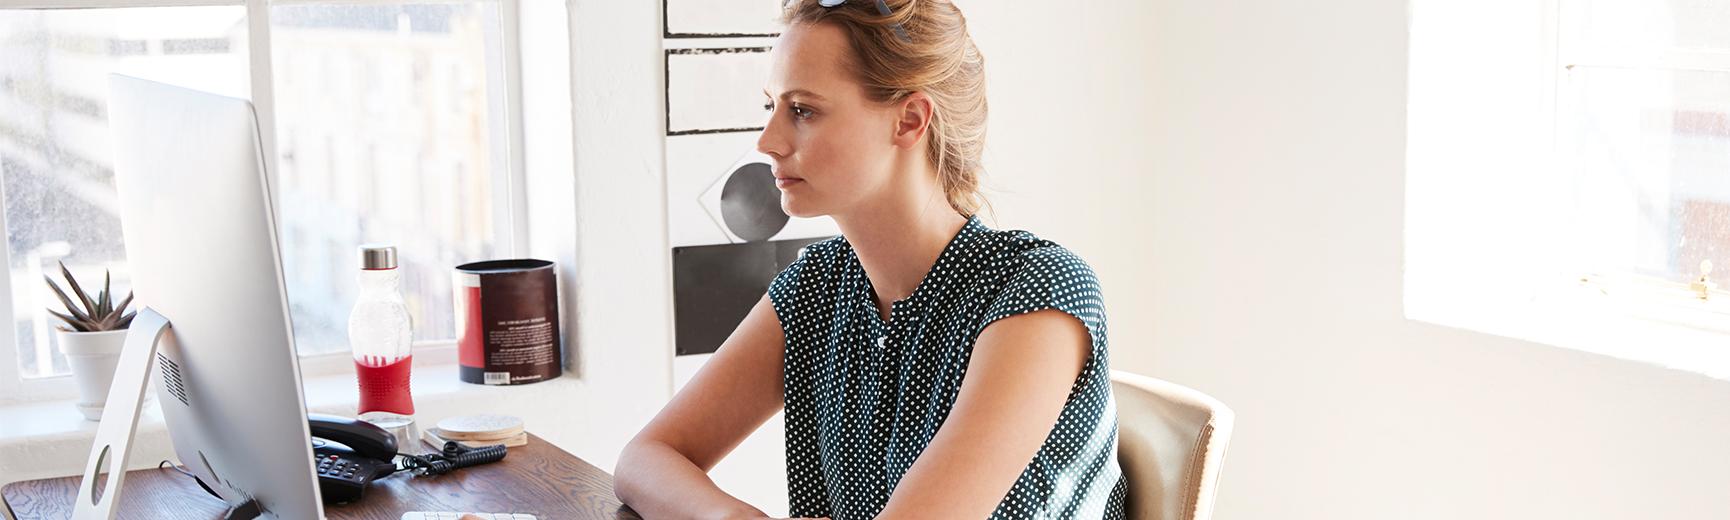 Online female student on laptop